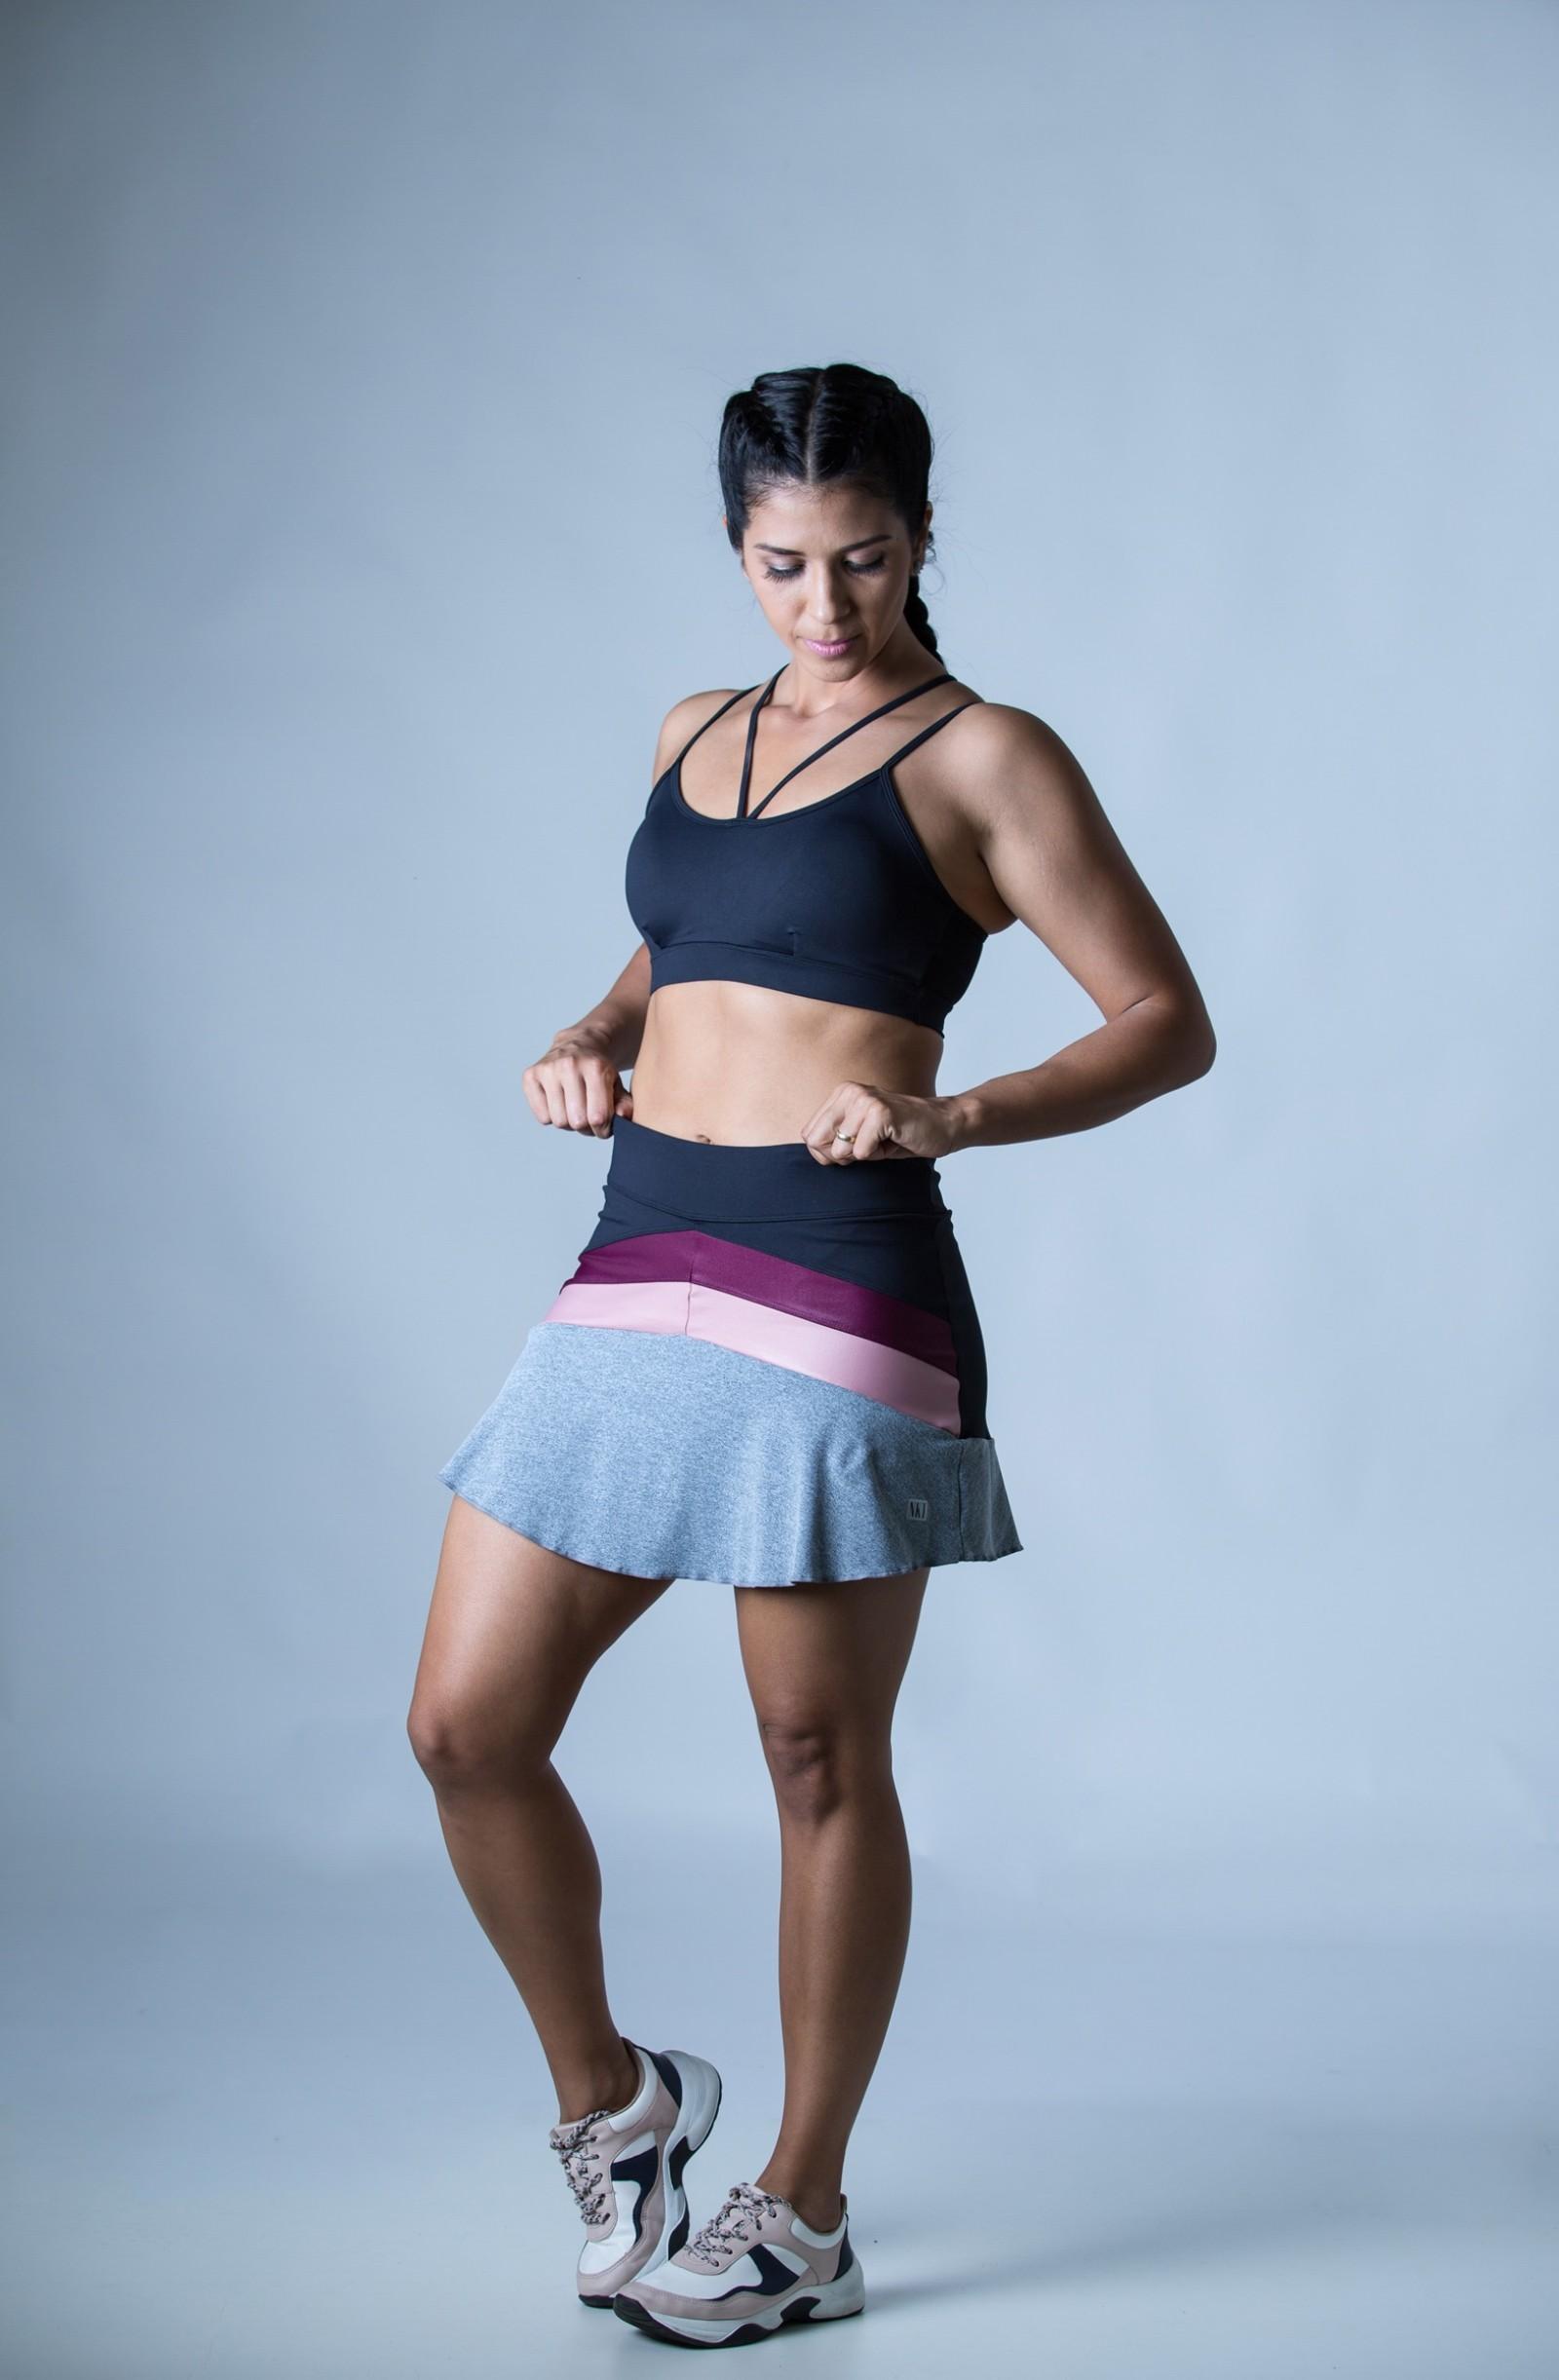 Saia Shorts Totality Rosa Bocca, Coleção Plenitude - NKT Fitwear Moda Fitness